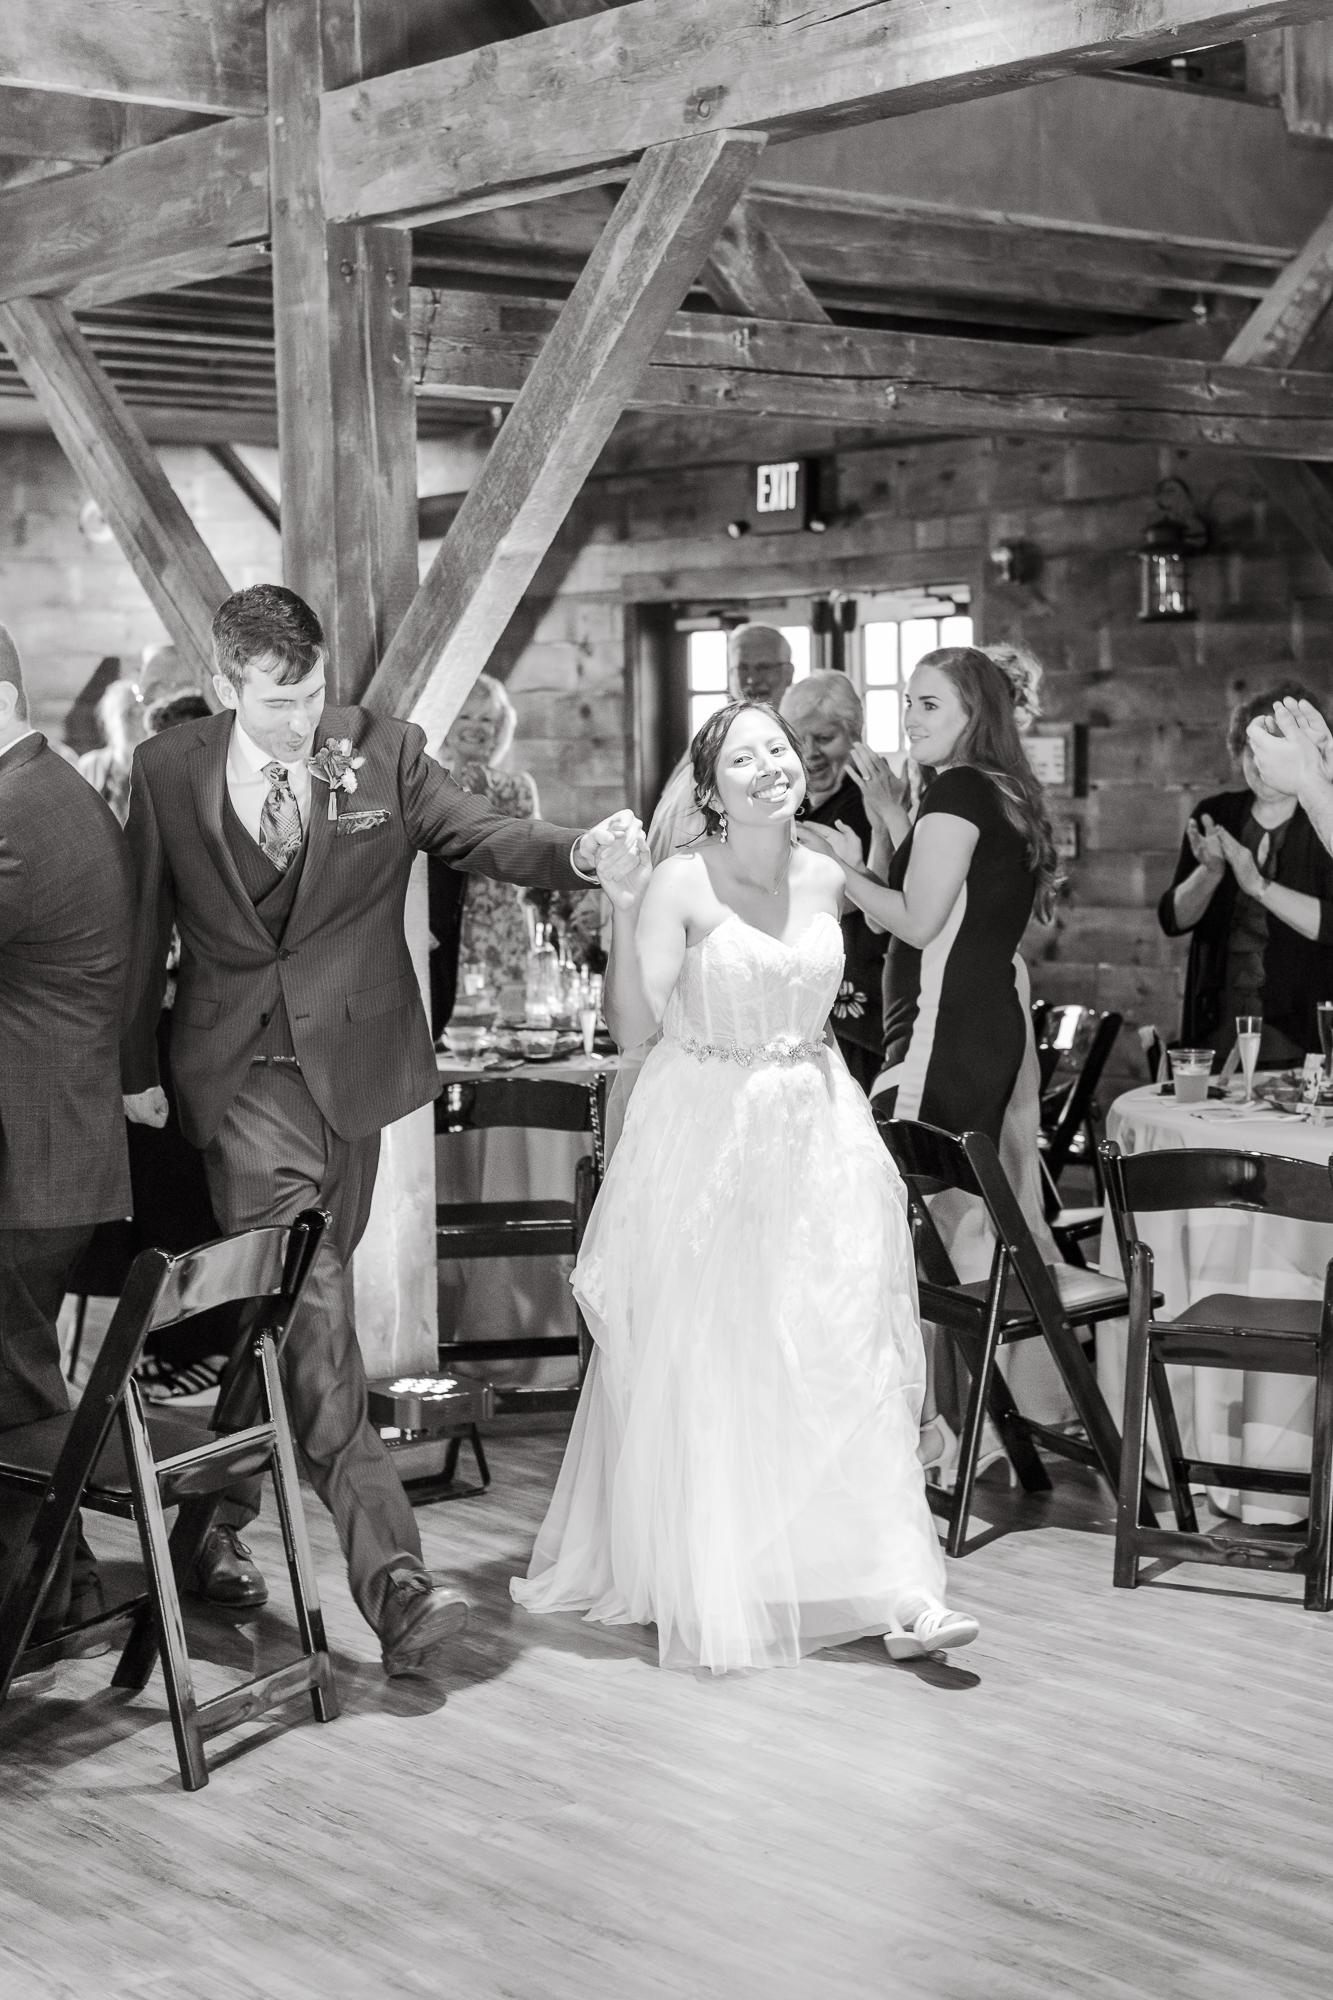 Maria+Adam_Summer Barn Wedding_The Barn at The North Star Perserve_Oberlin_Ohio-182.jpg